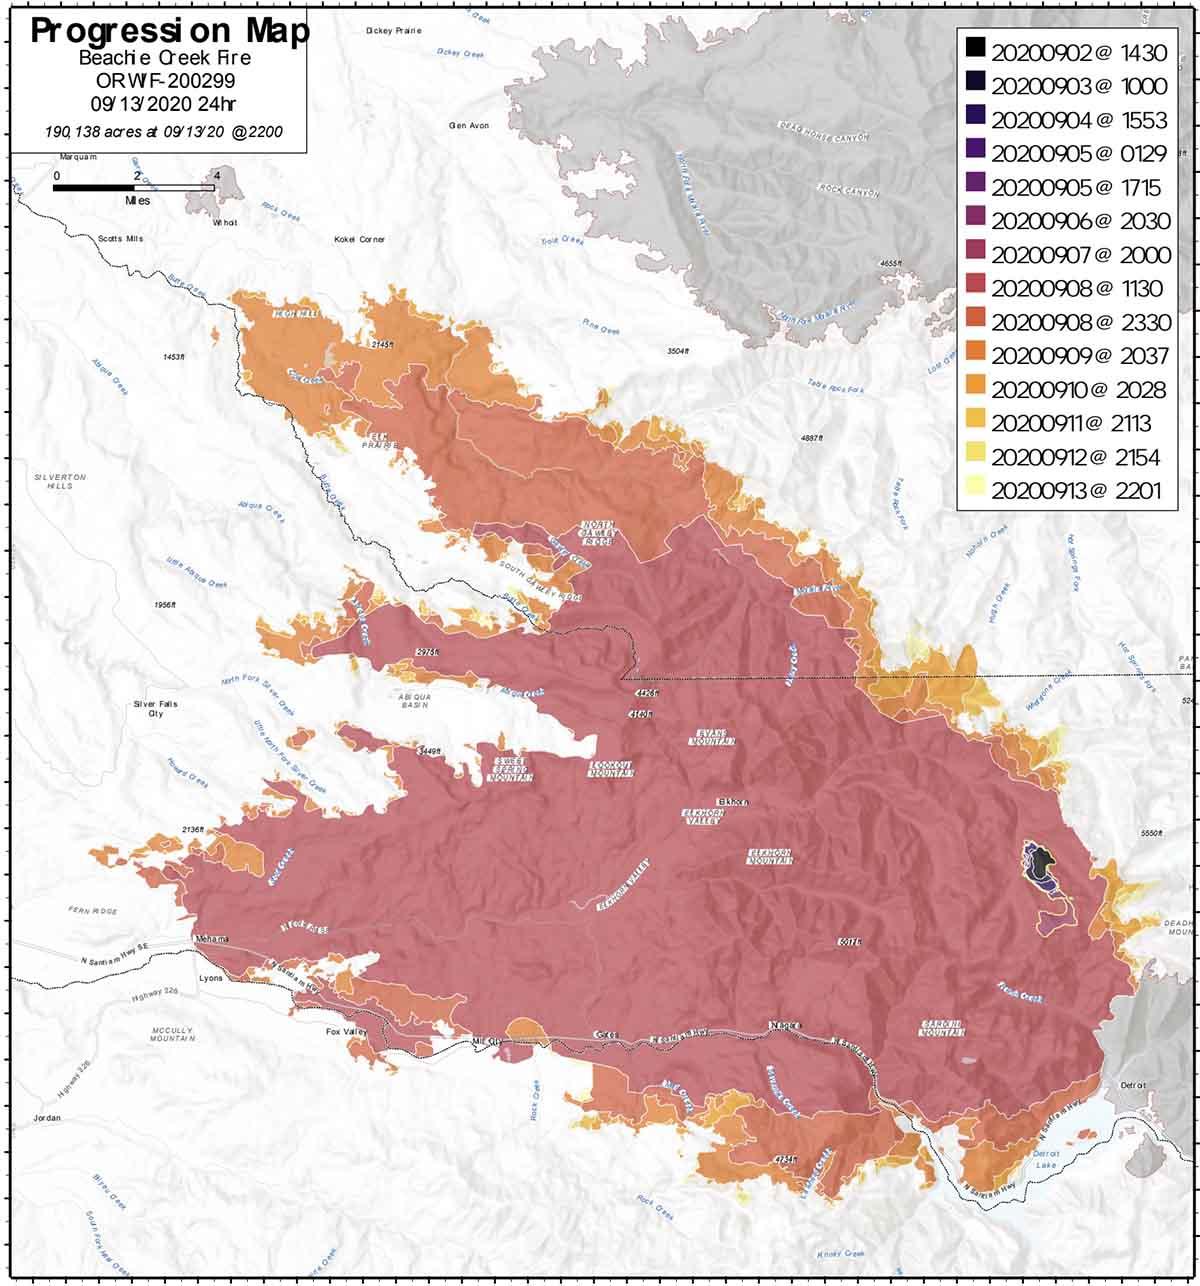 Beachie Creek Fire progression map